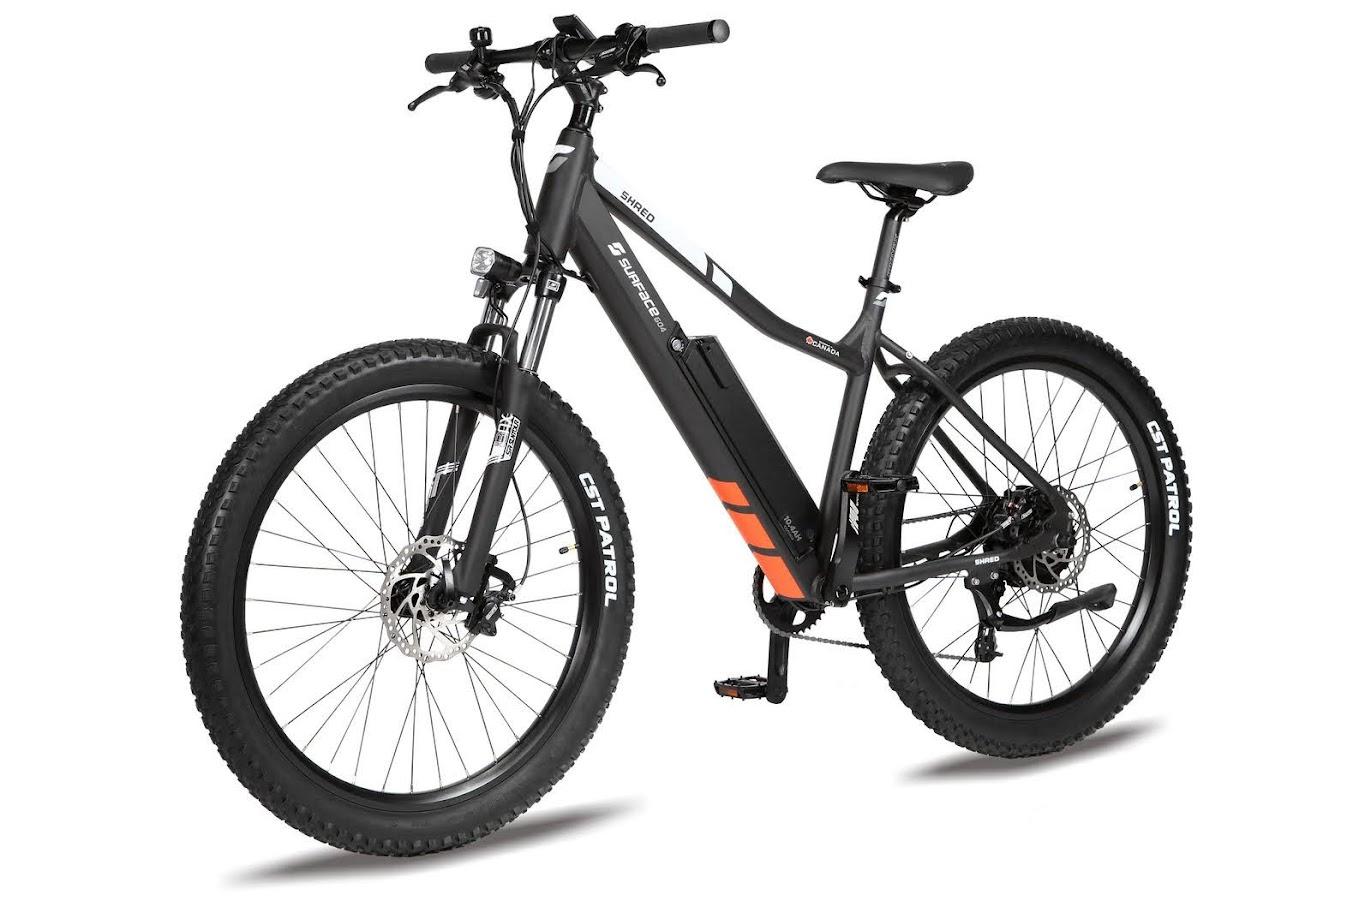 New Shred Electric 27.5 Hardtail 48V Mountain bike 500W ebike bicycle